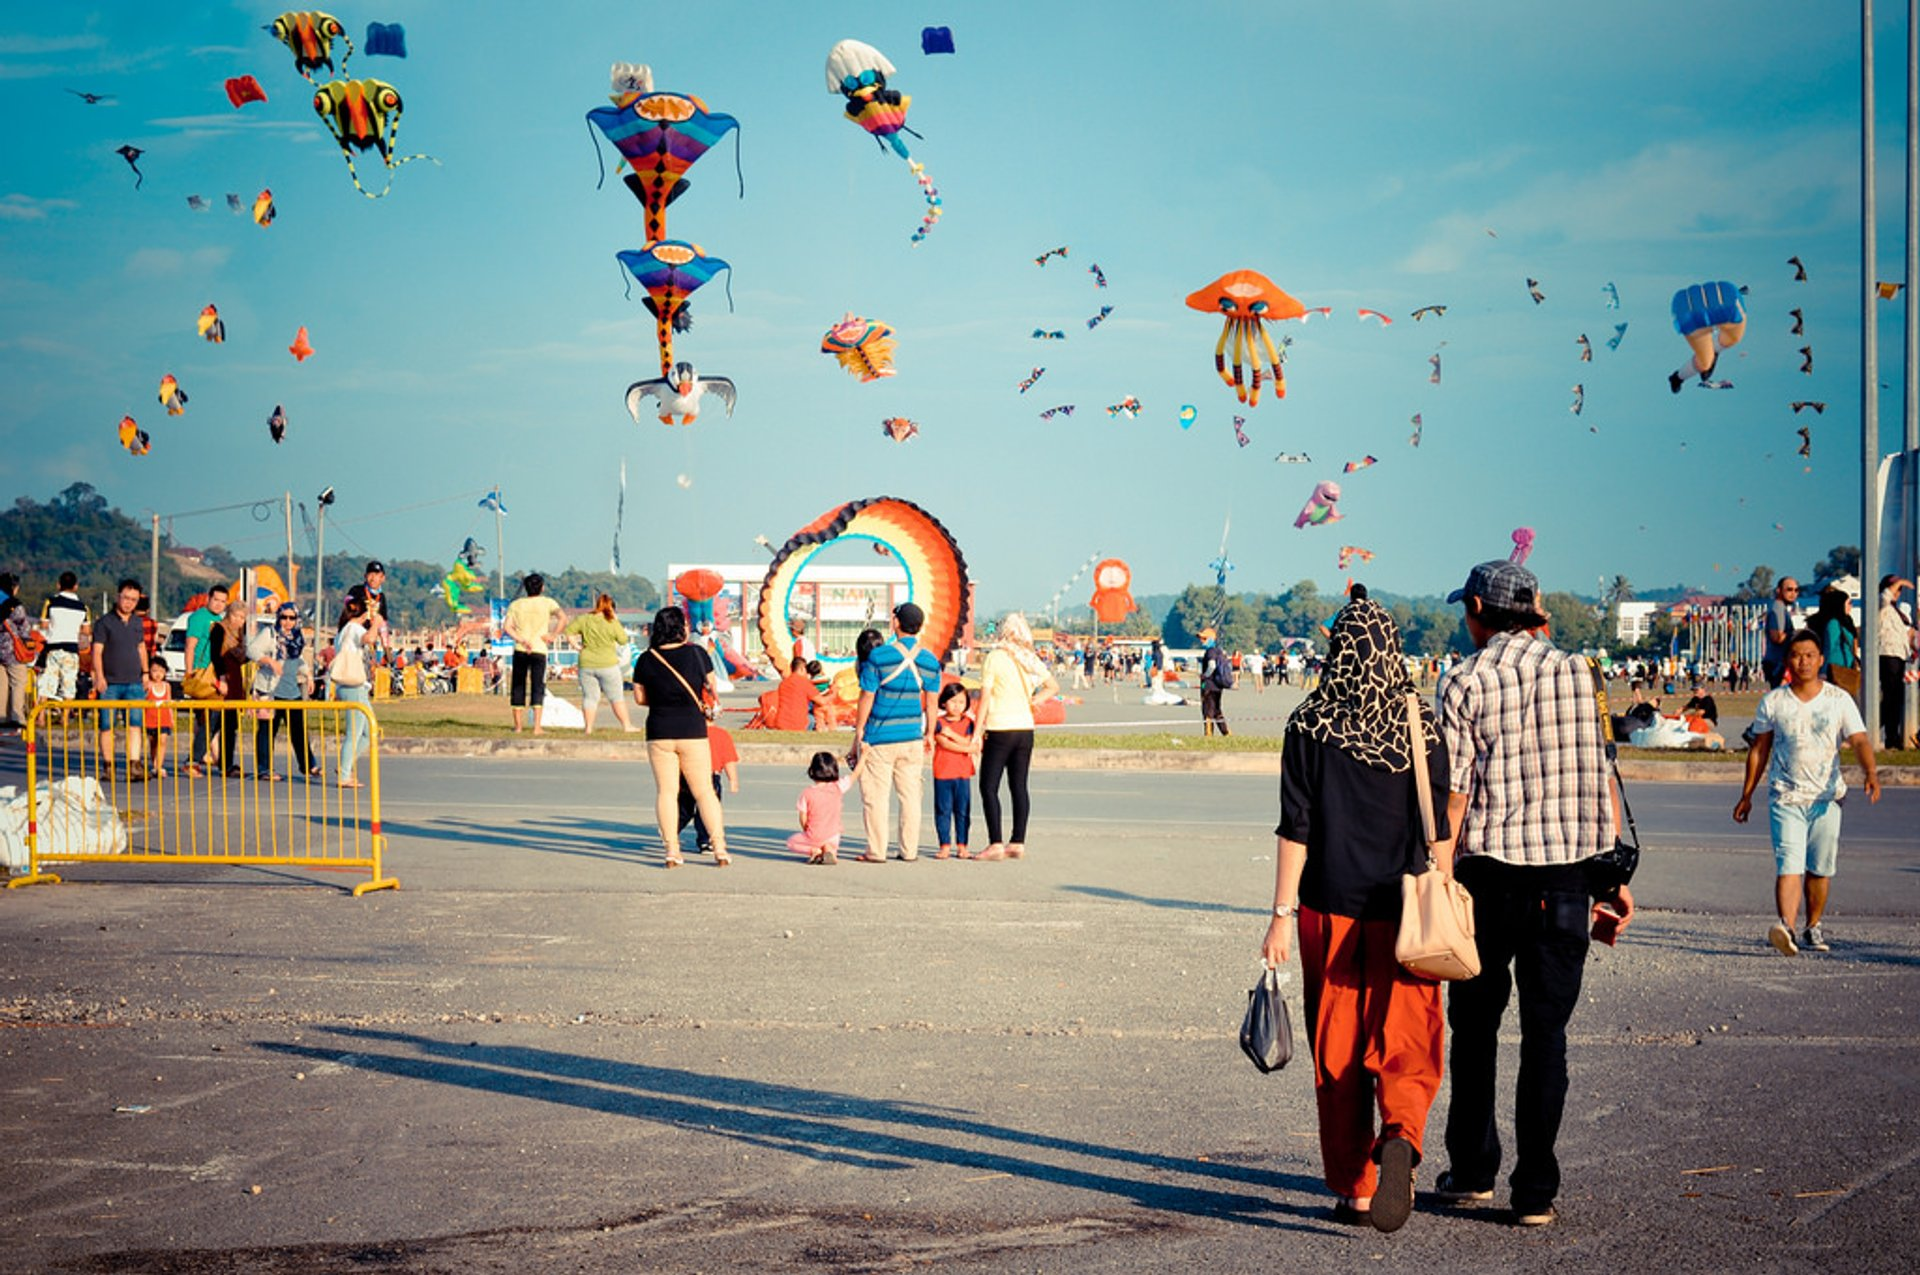 Borneo International Kite Festival in Borneo - Best Time